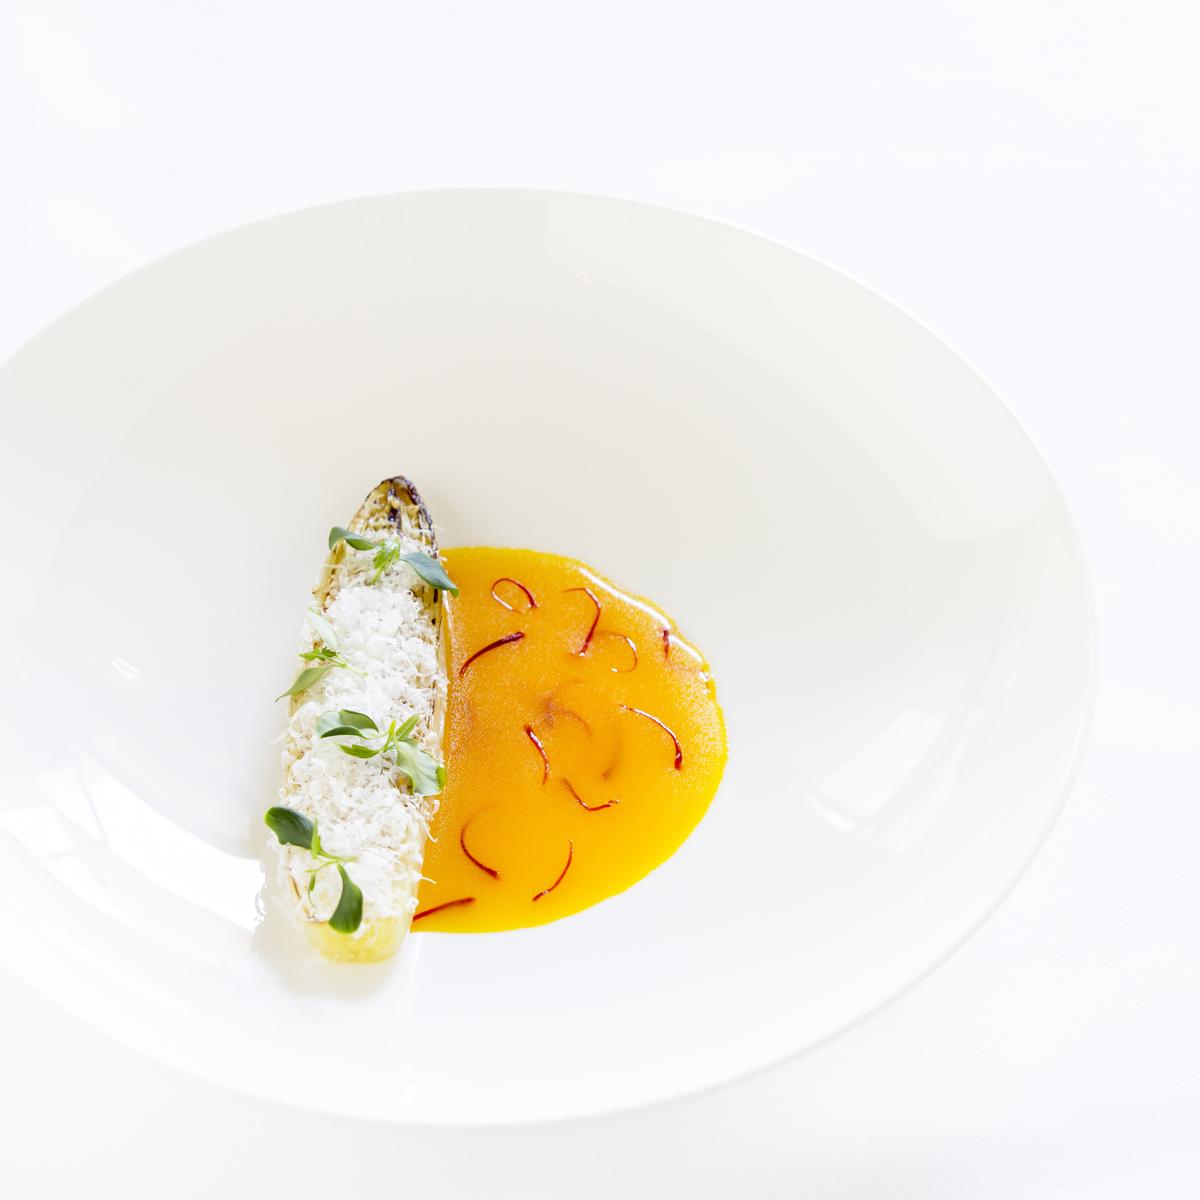 Entree, Tommaso Calonaci Chef